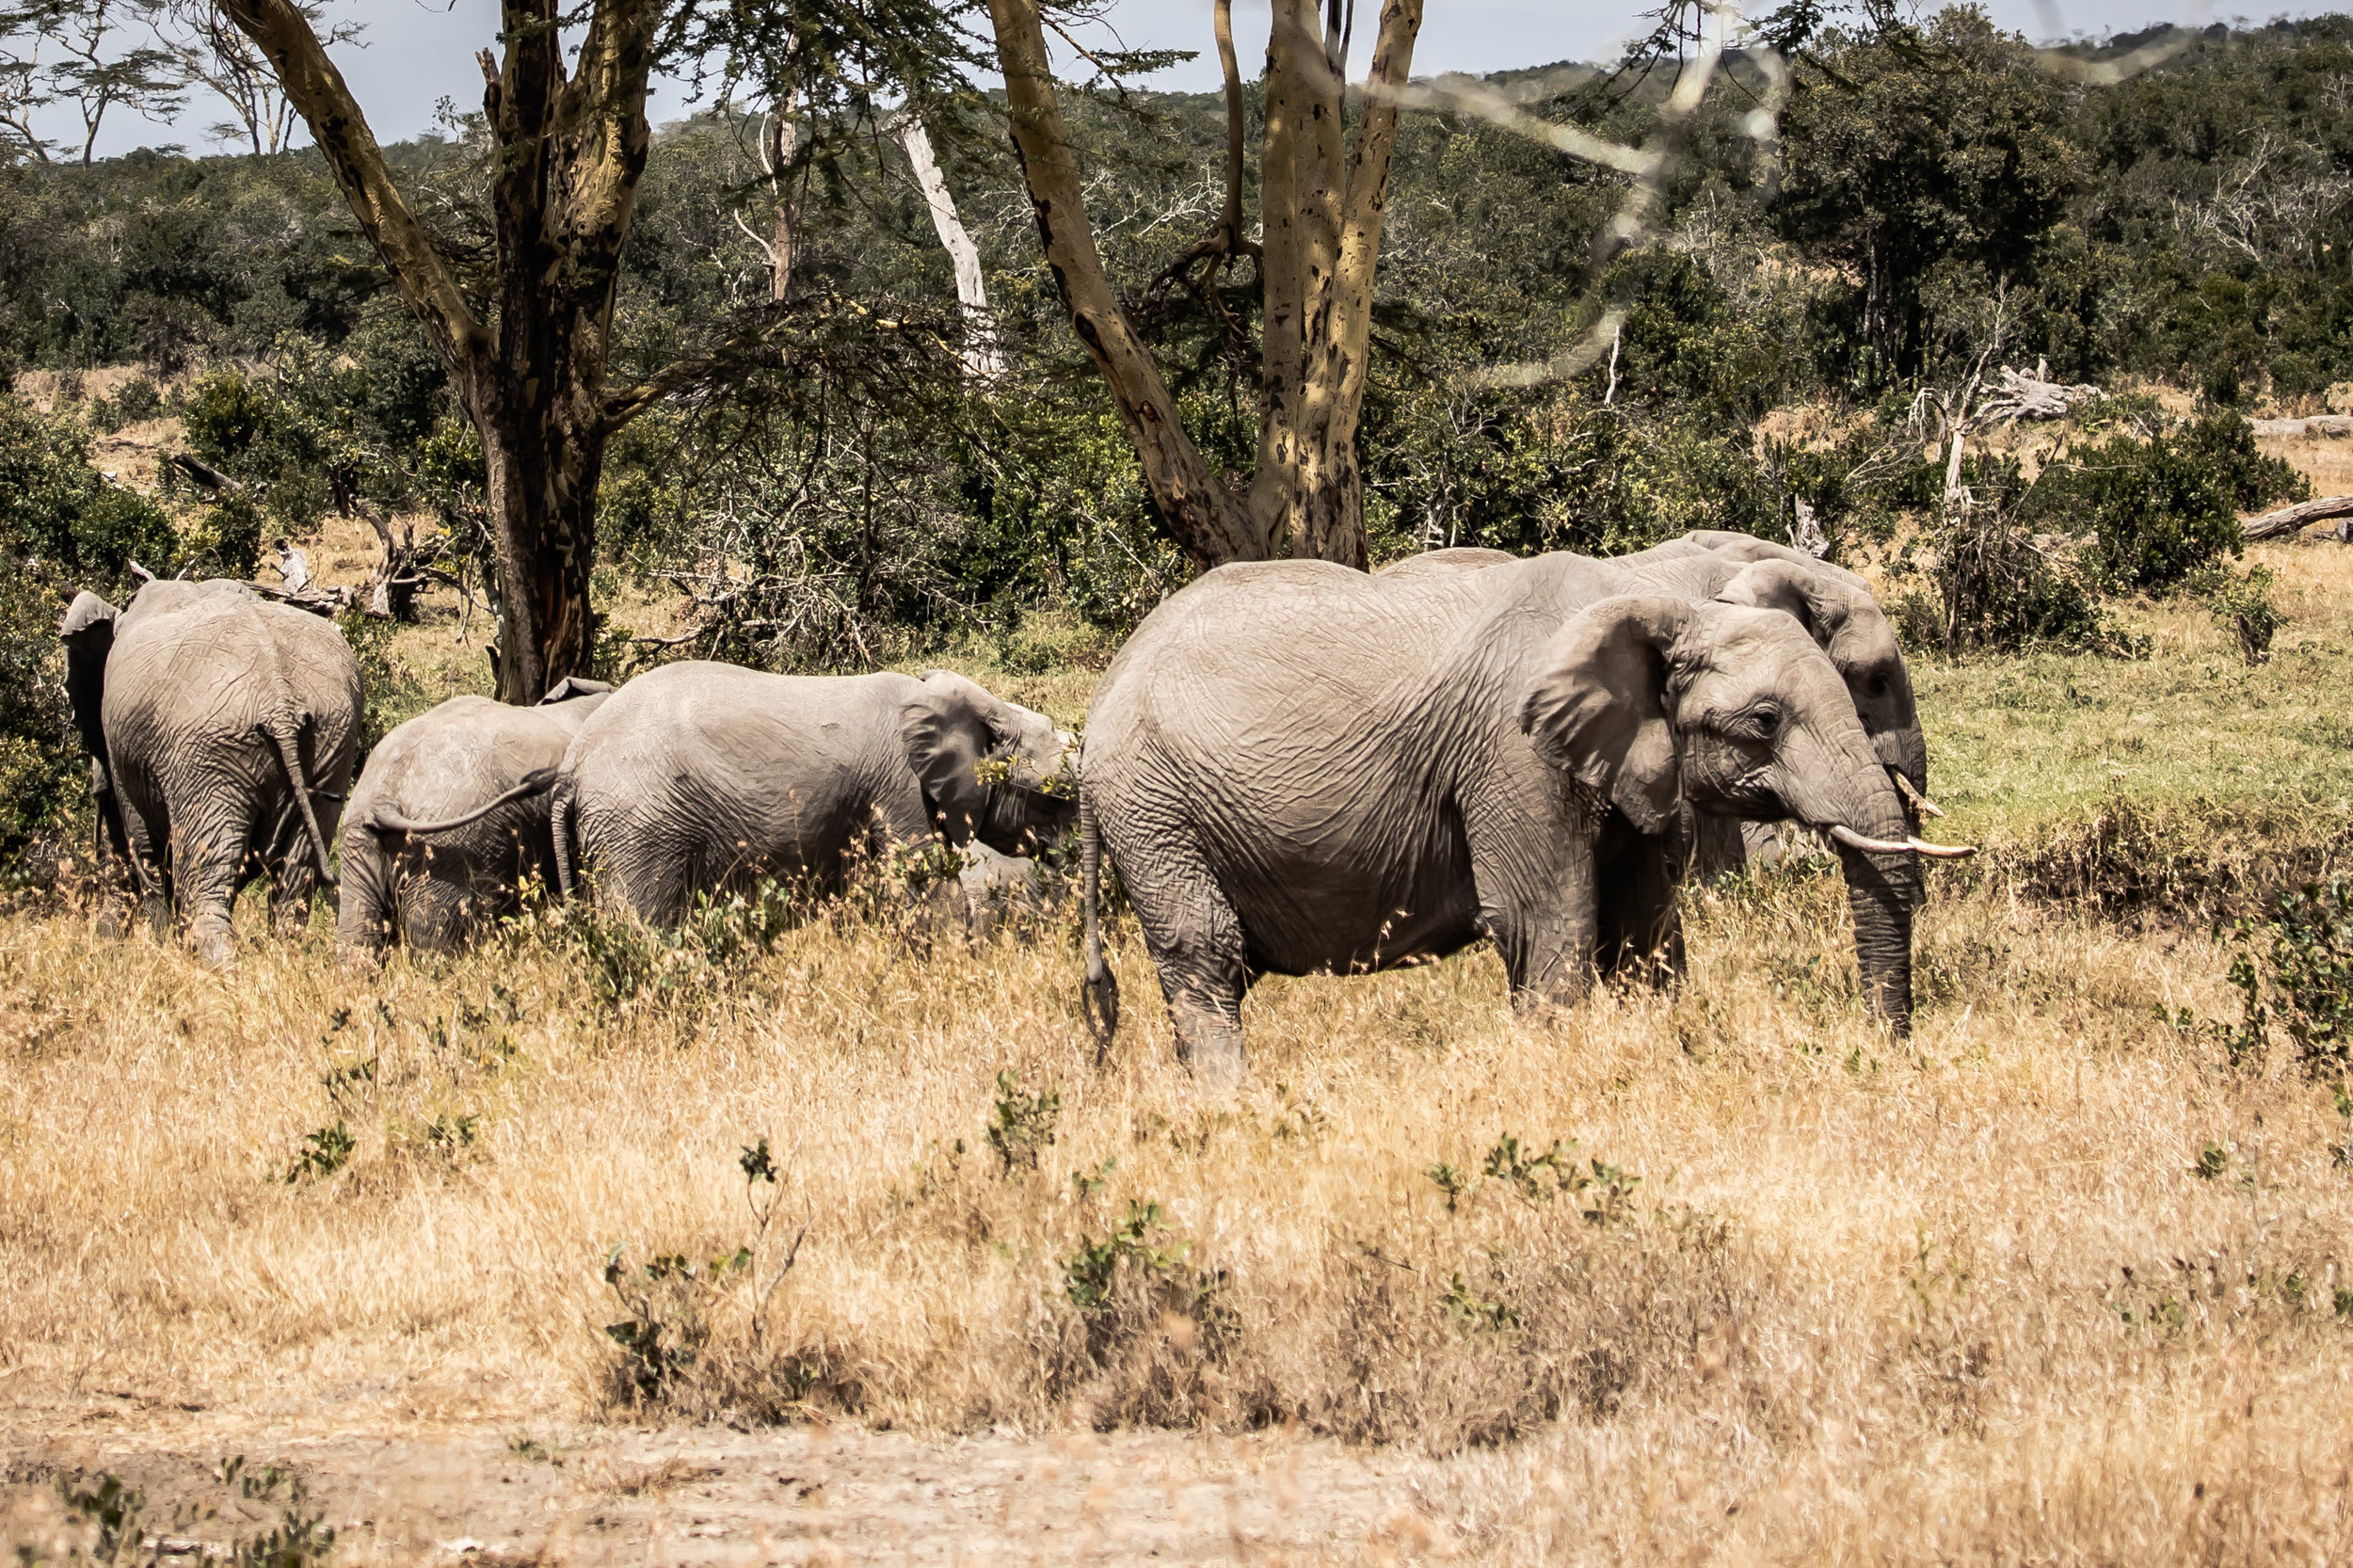 Elephants on the move, Ol Pejeta Reserve, Kenya